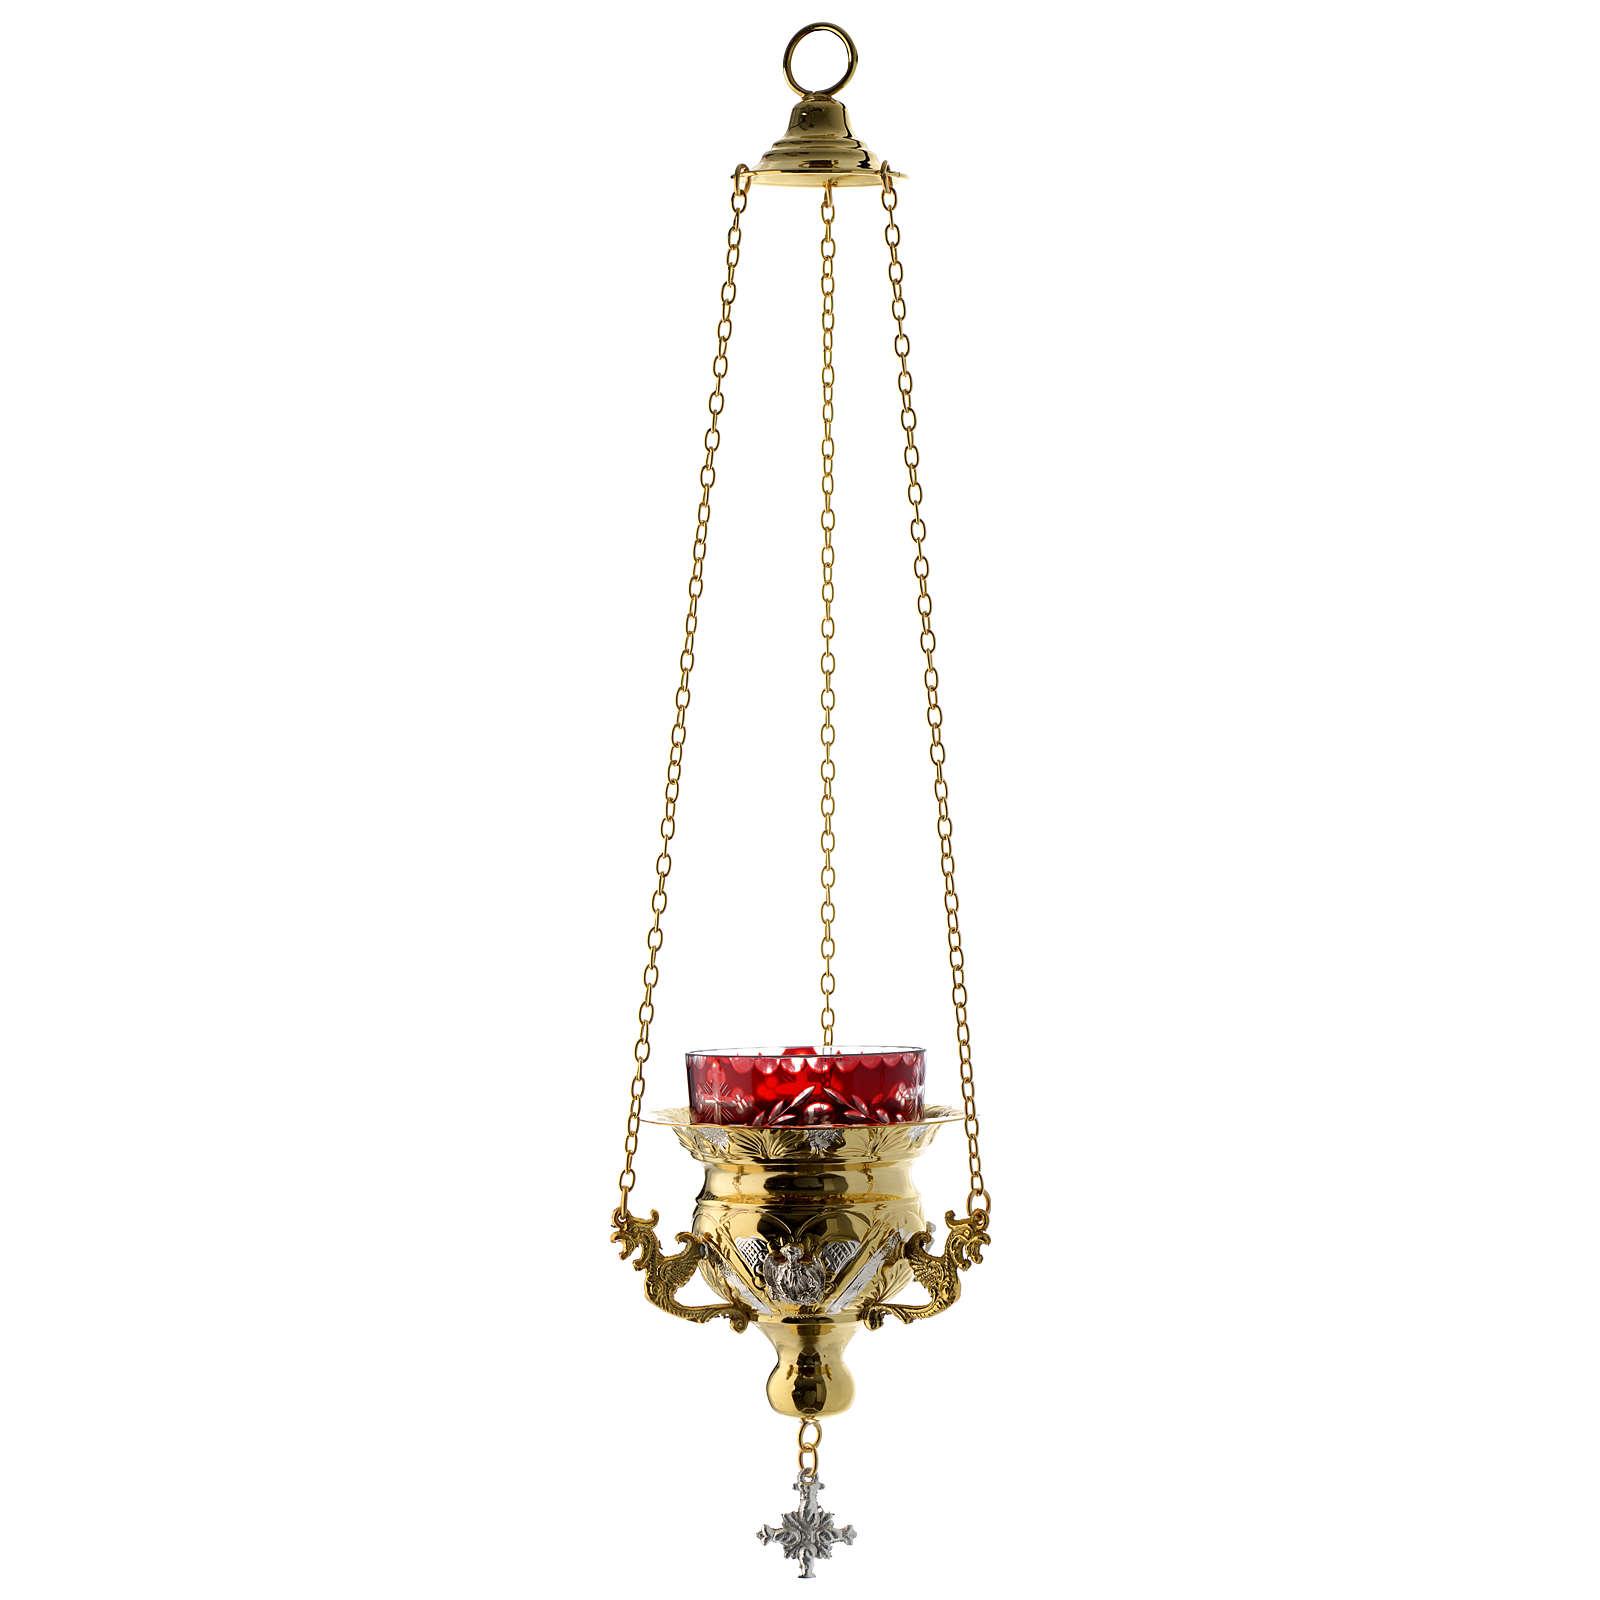 Lampada per Santissimo Ortodossa dorata cm 12X11.5 3